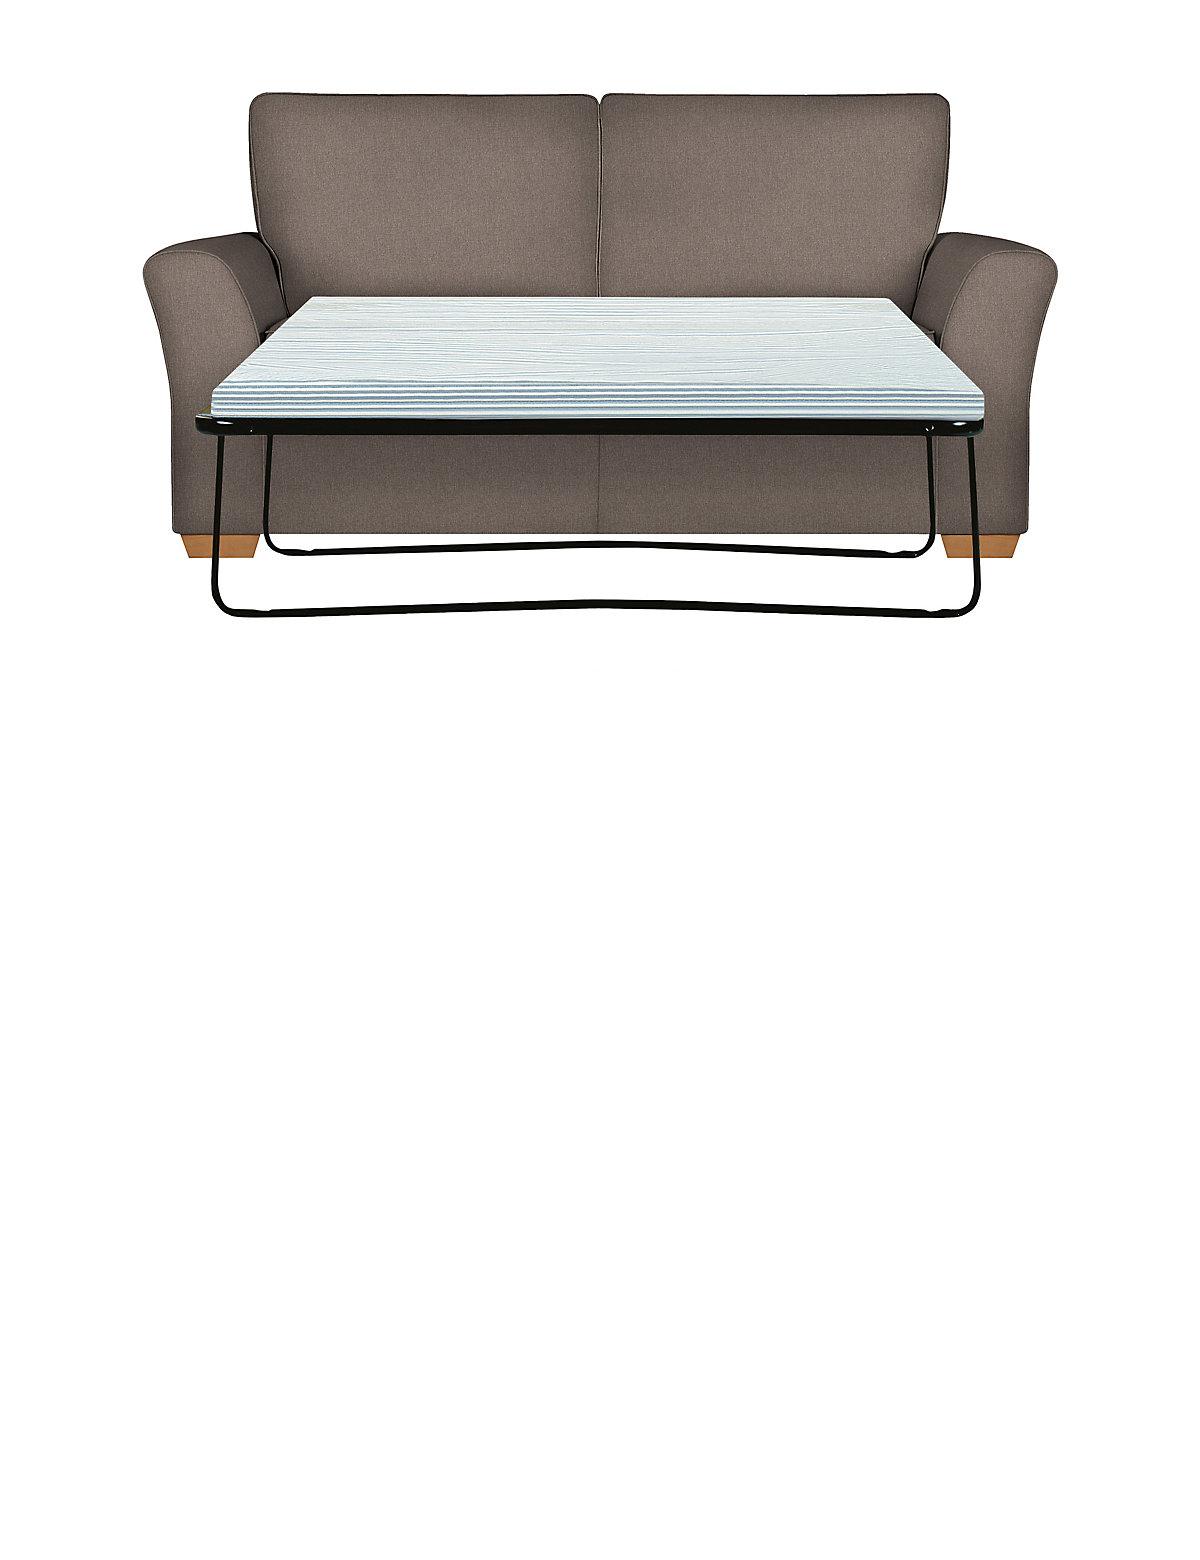 Marks Spencer Catalogue Furniture From Marks Spencer At